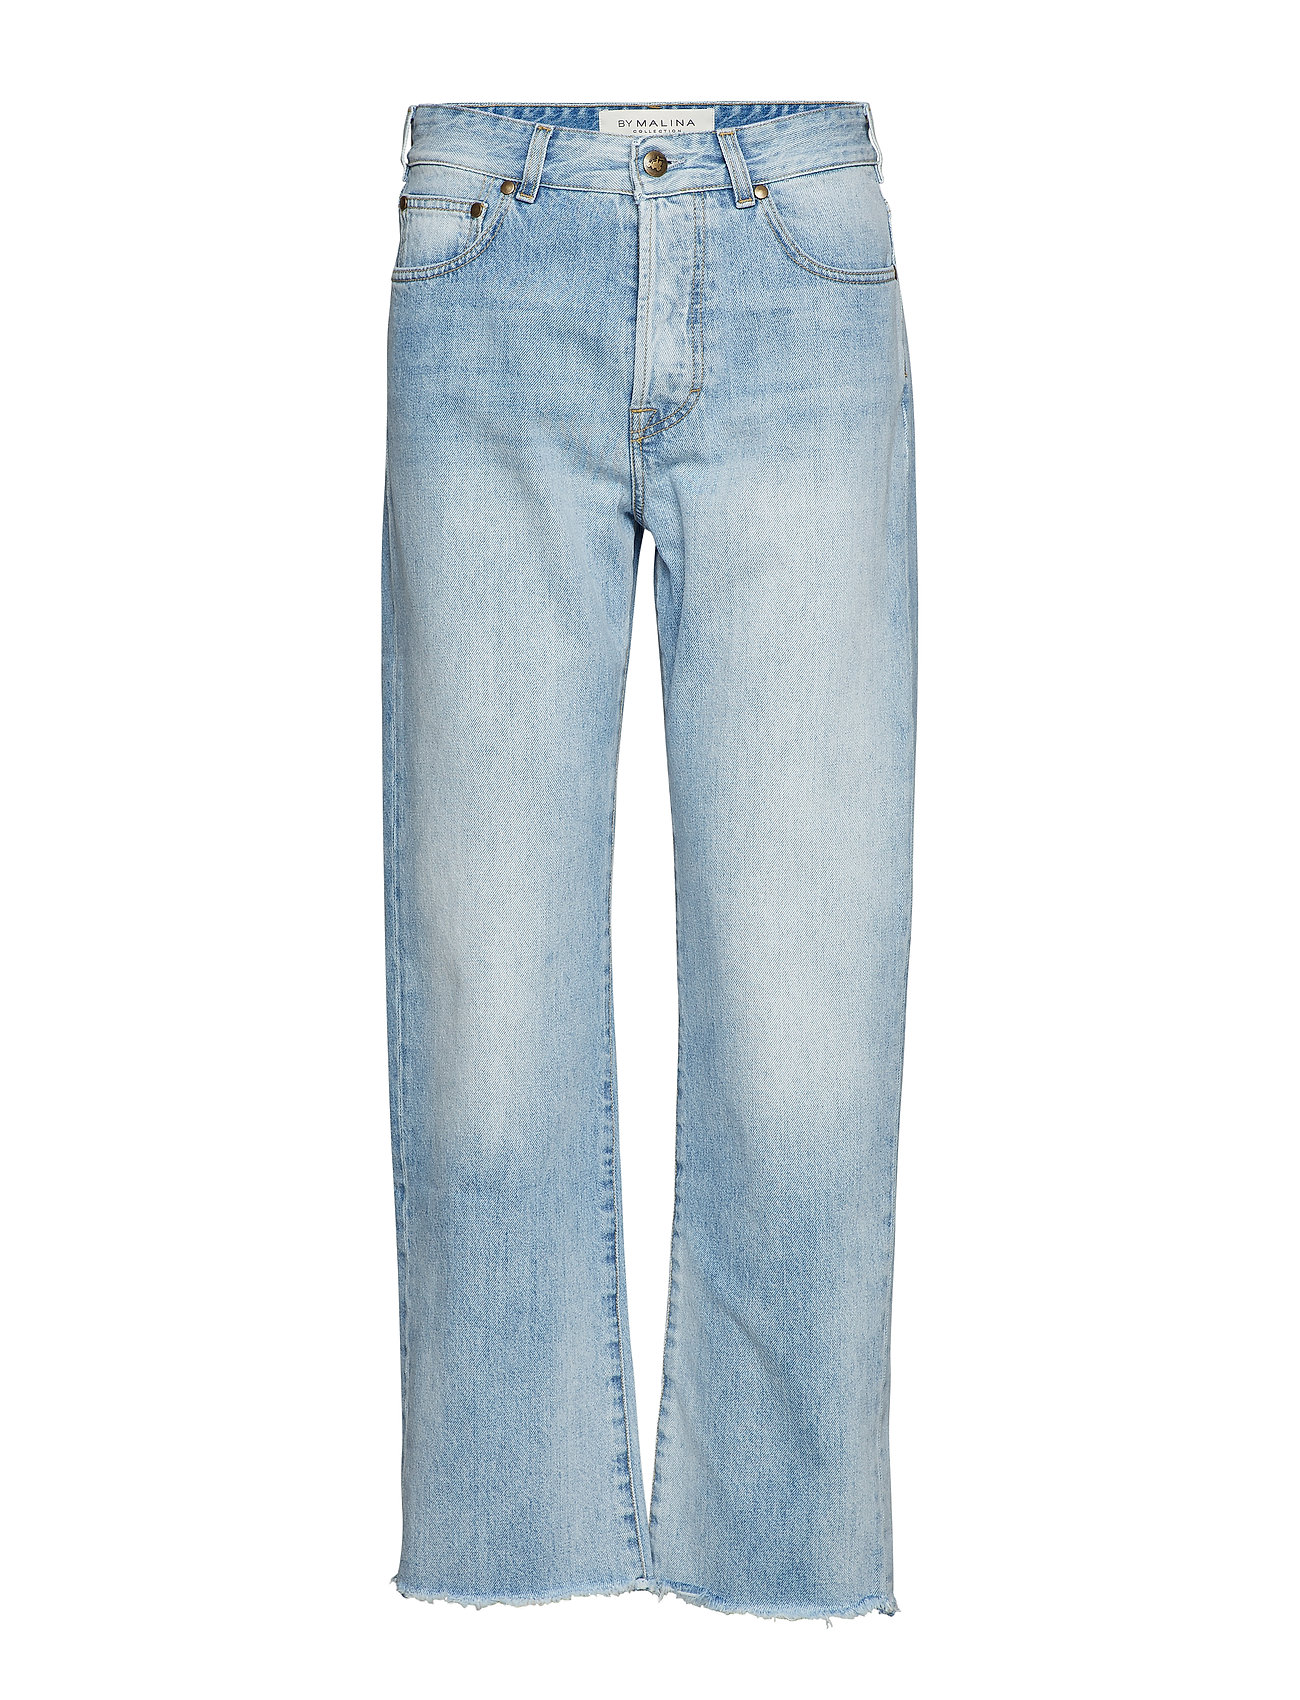 By Malina Alexa jeans - LIGHT BLUE WASH